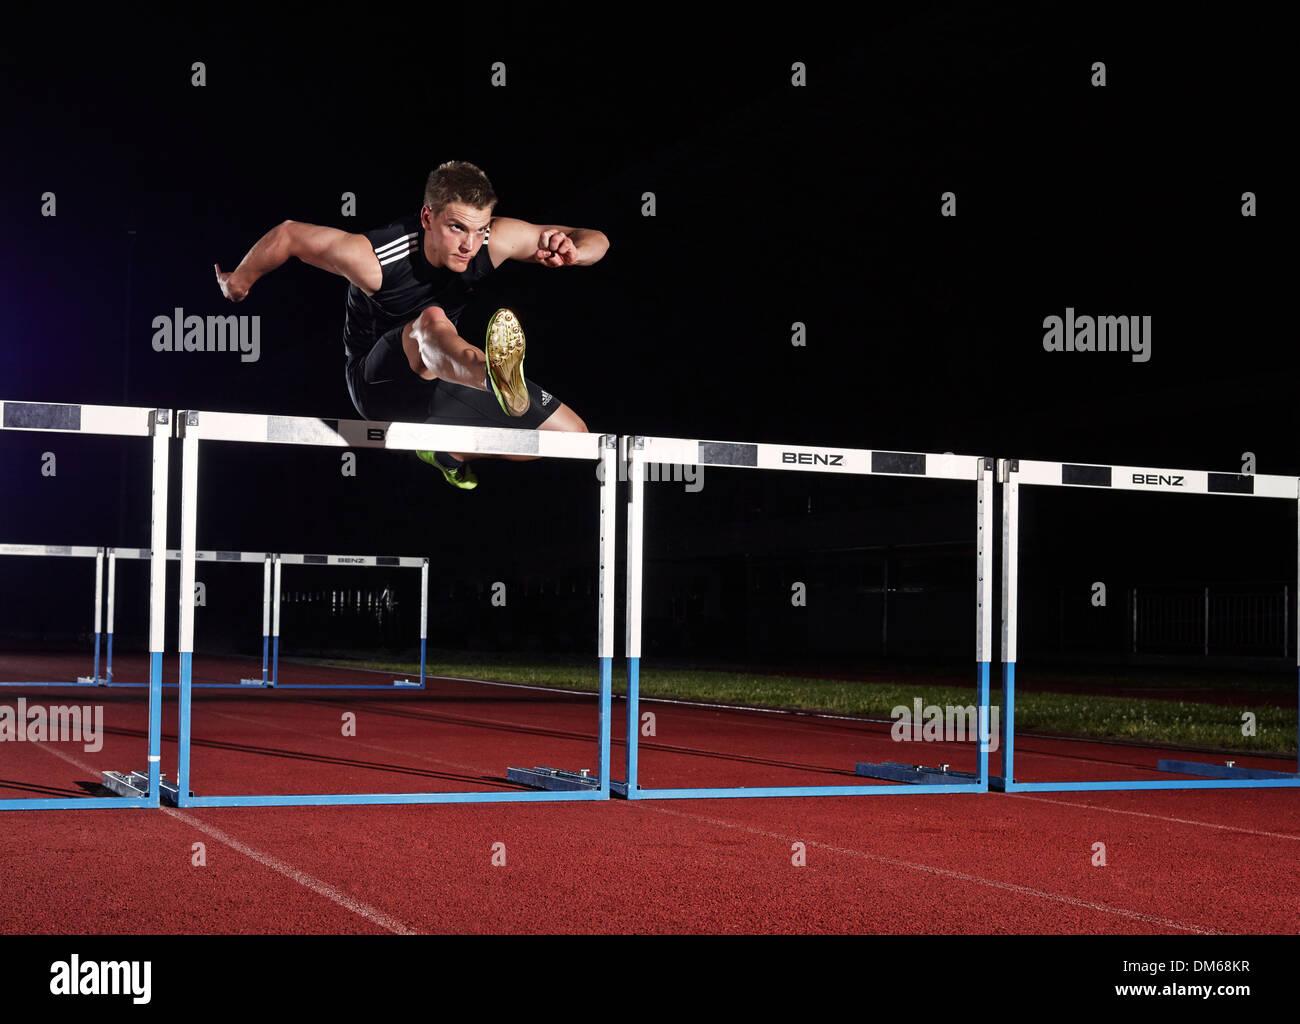 Ostacolo racing atleta Immagini Stock